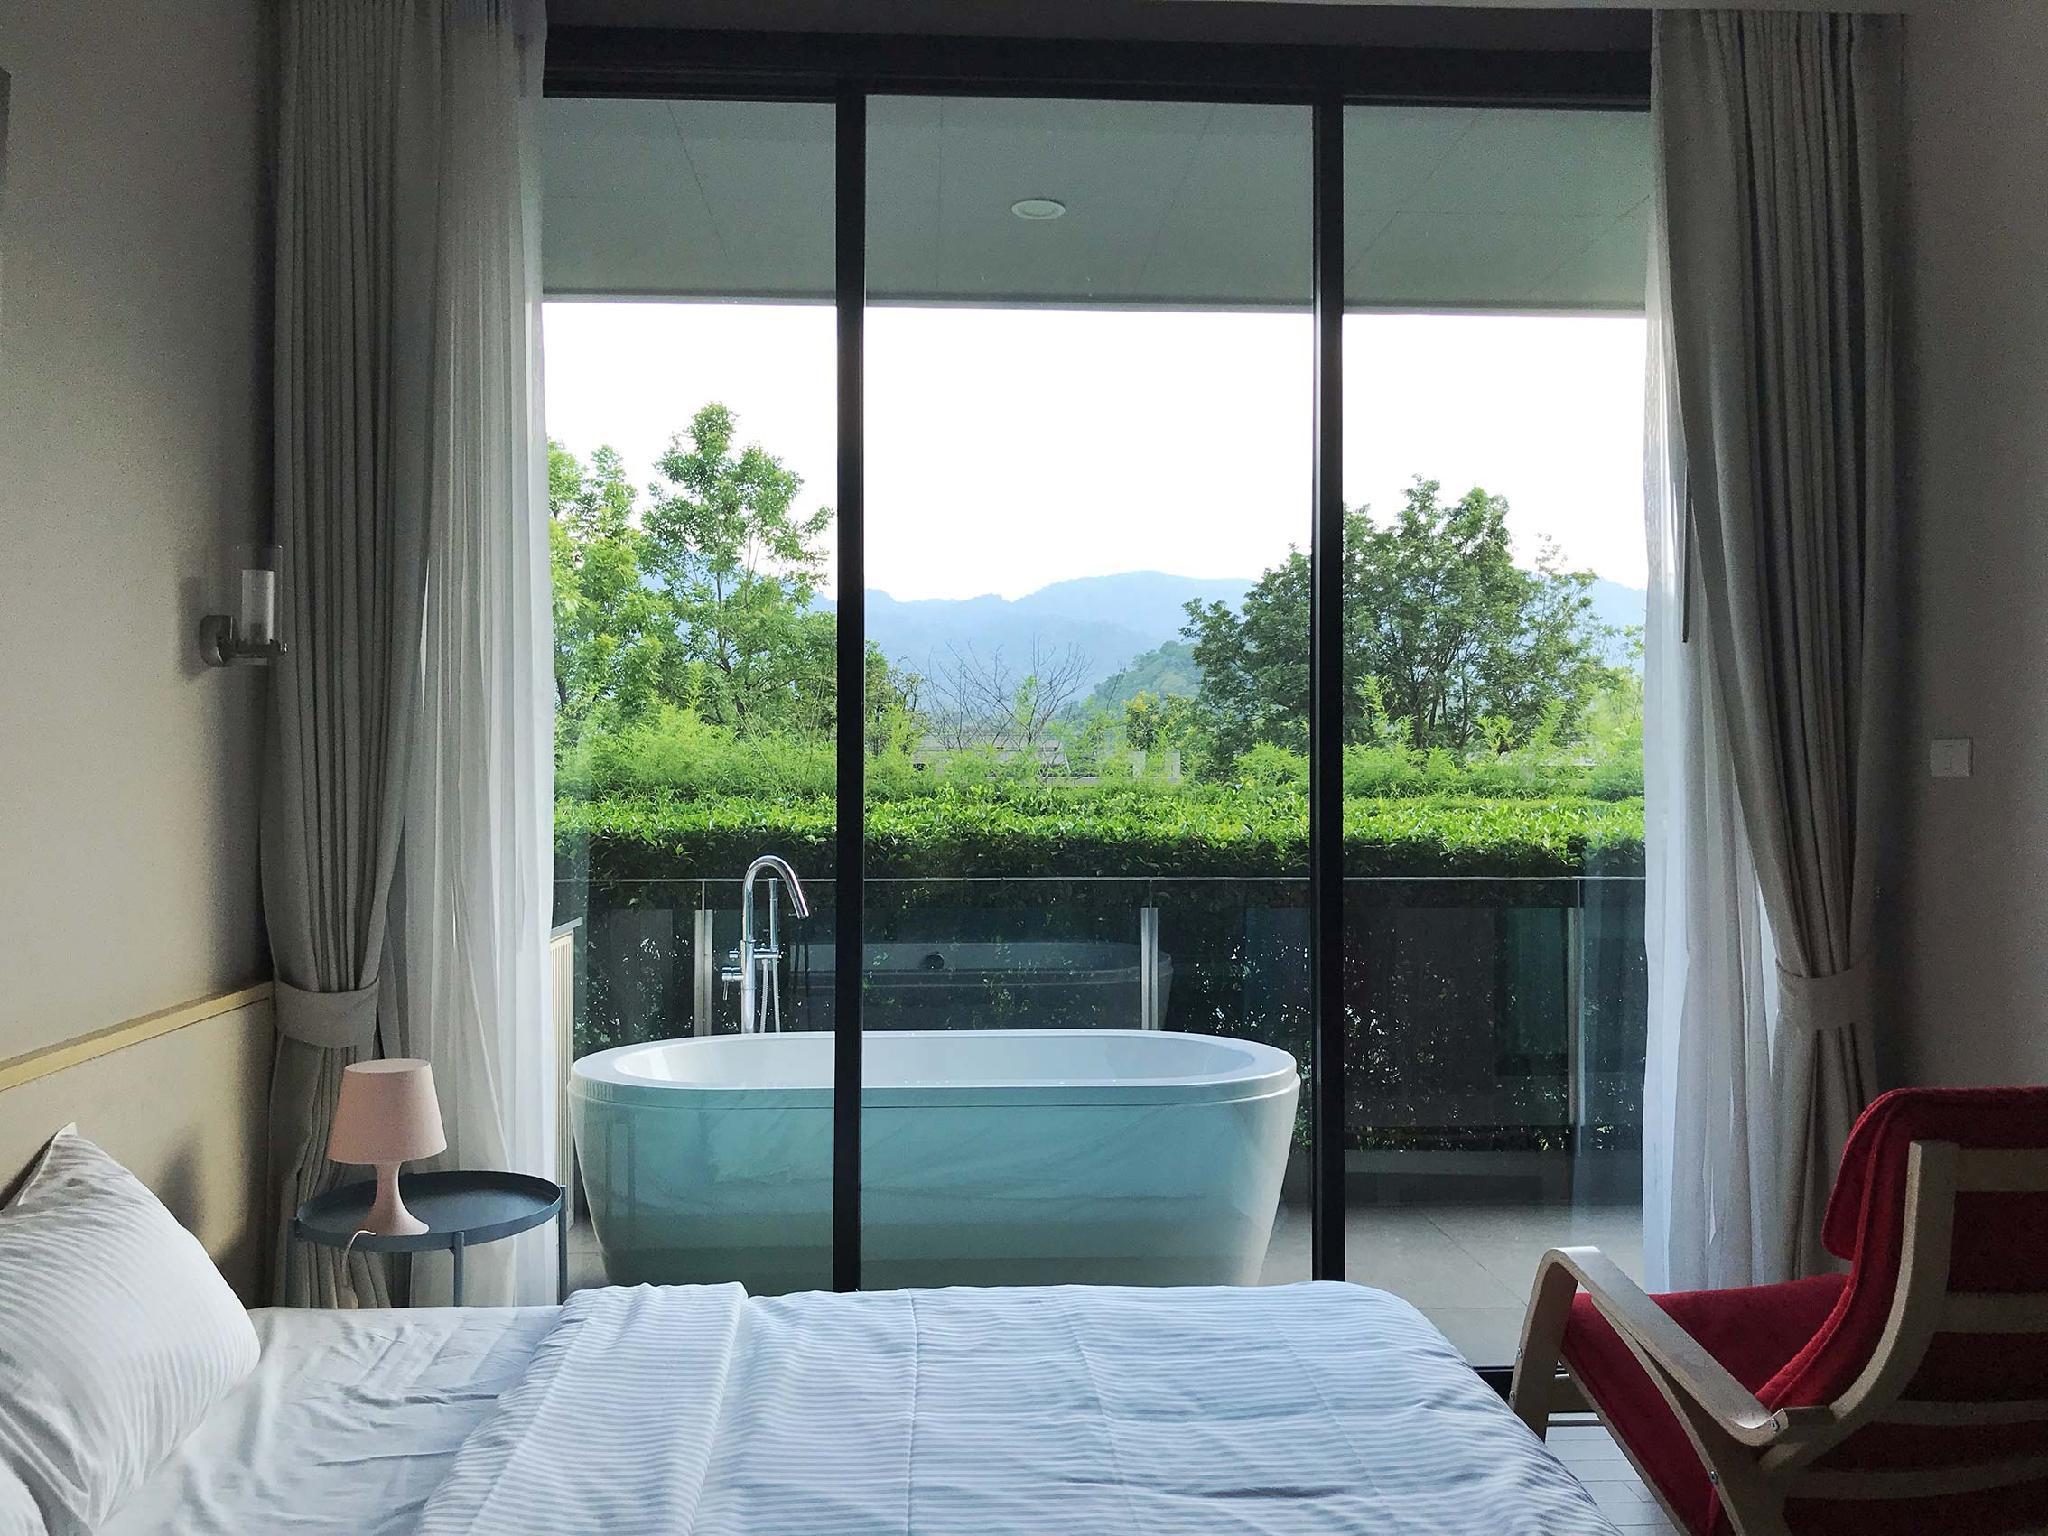 KHAO YAI 2BR Suite KhaoYai Luxury Condo